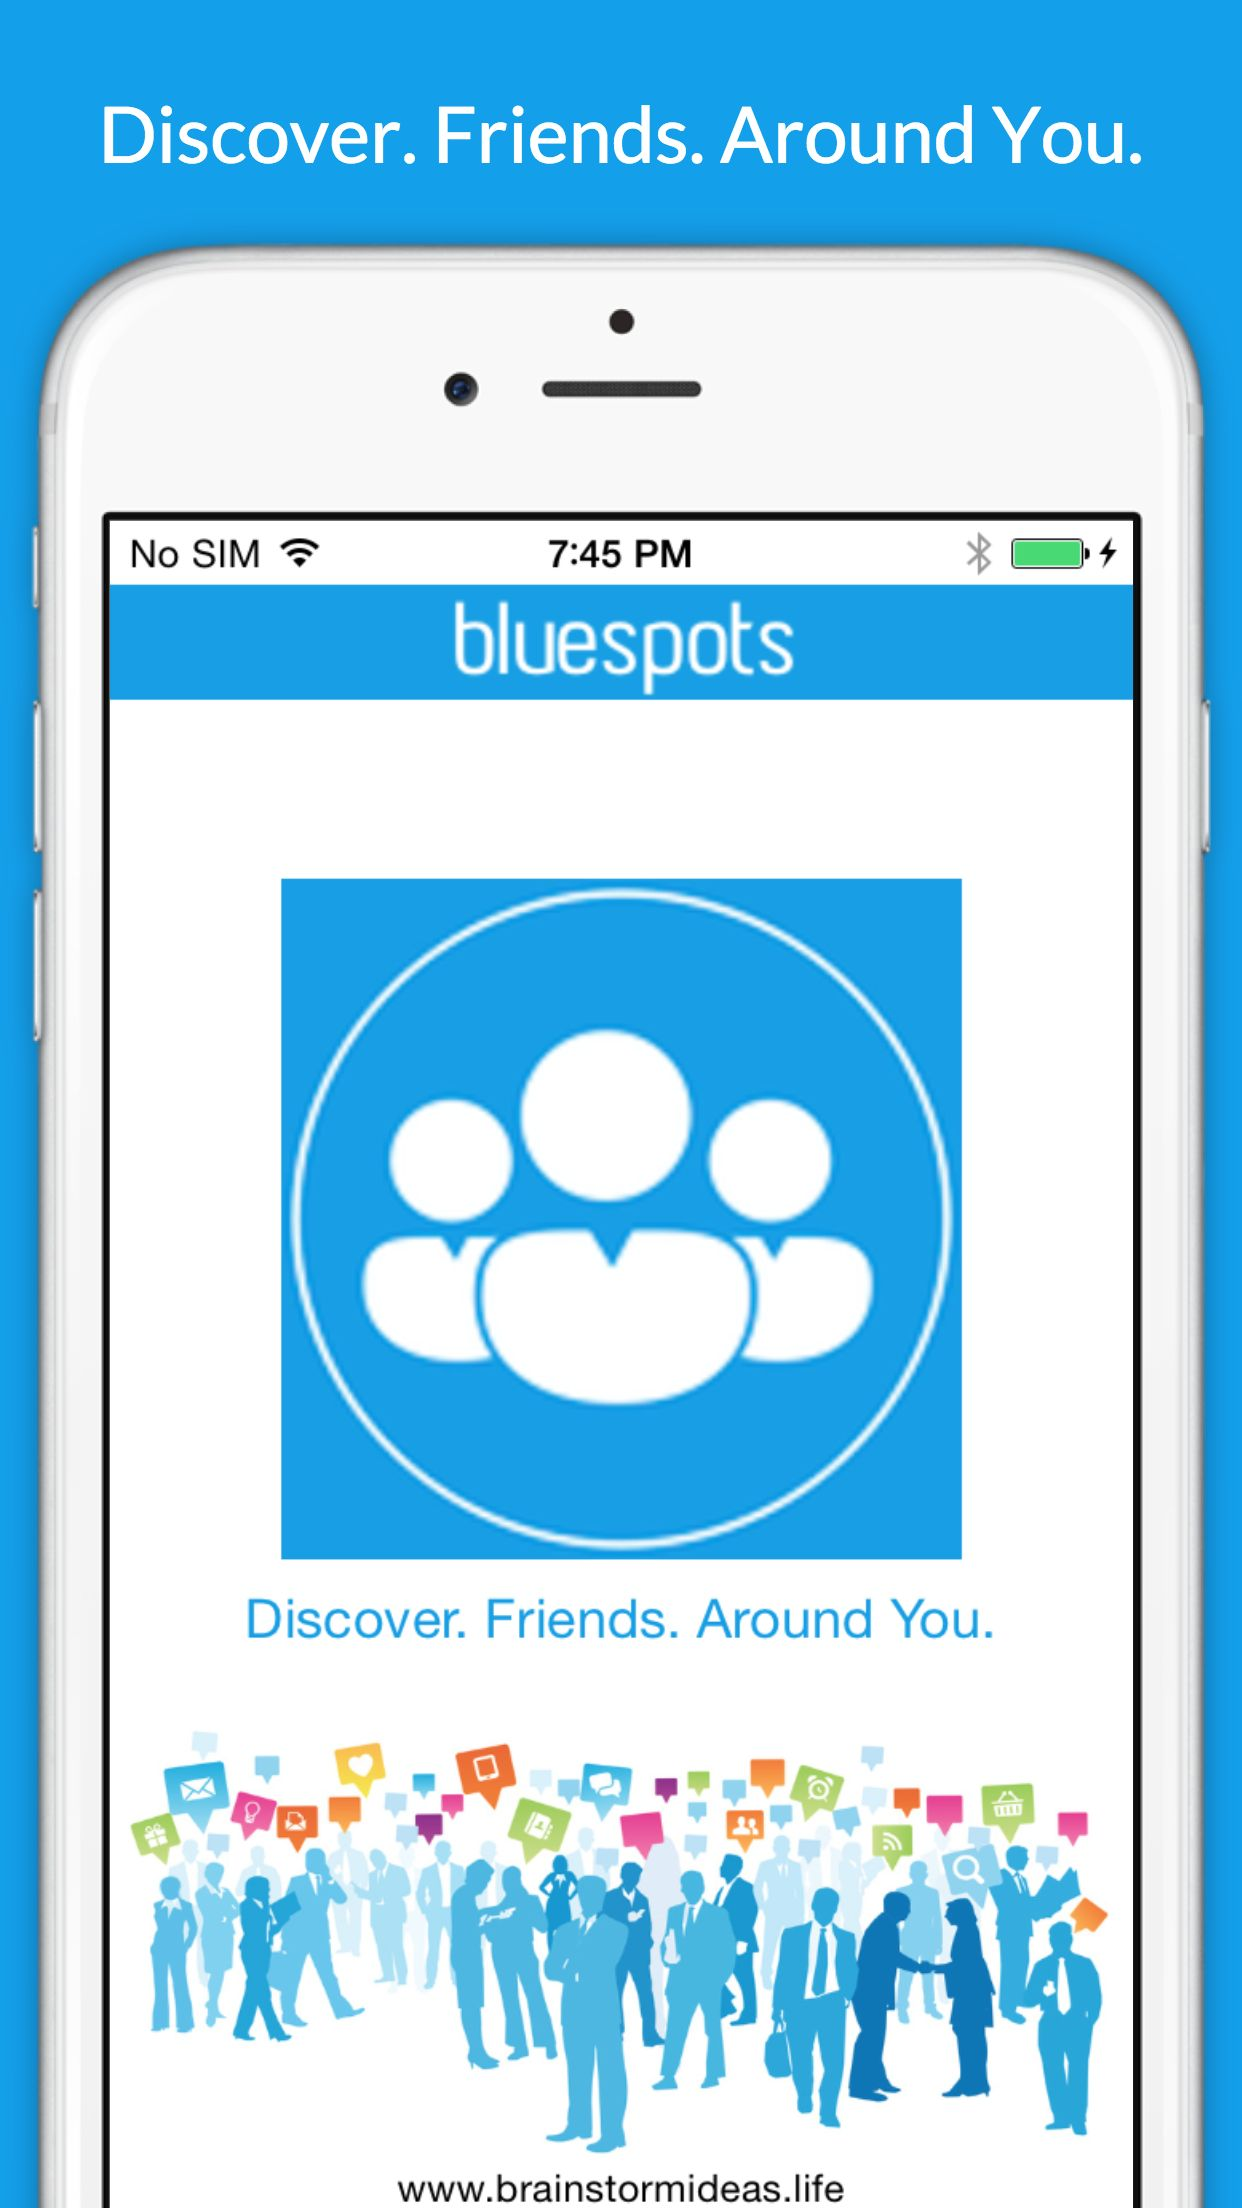 bluespots